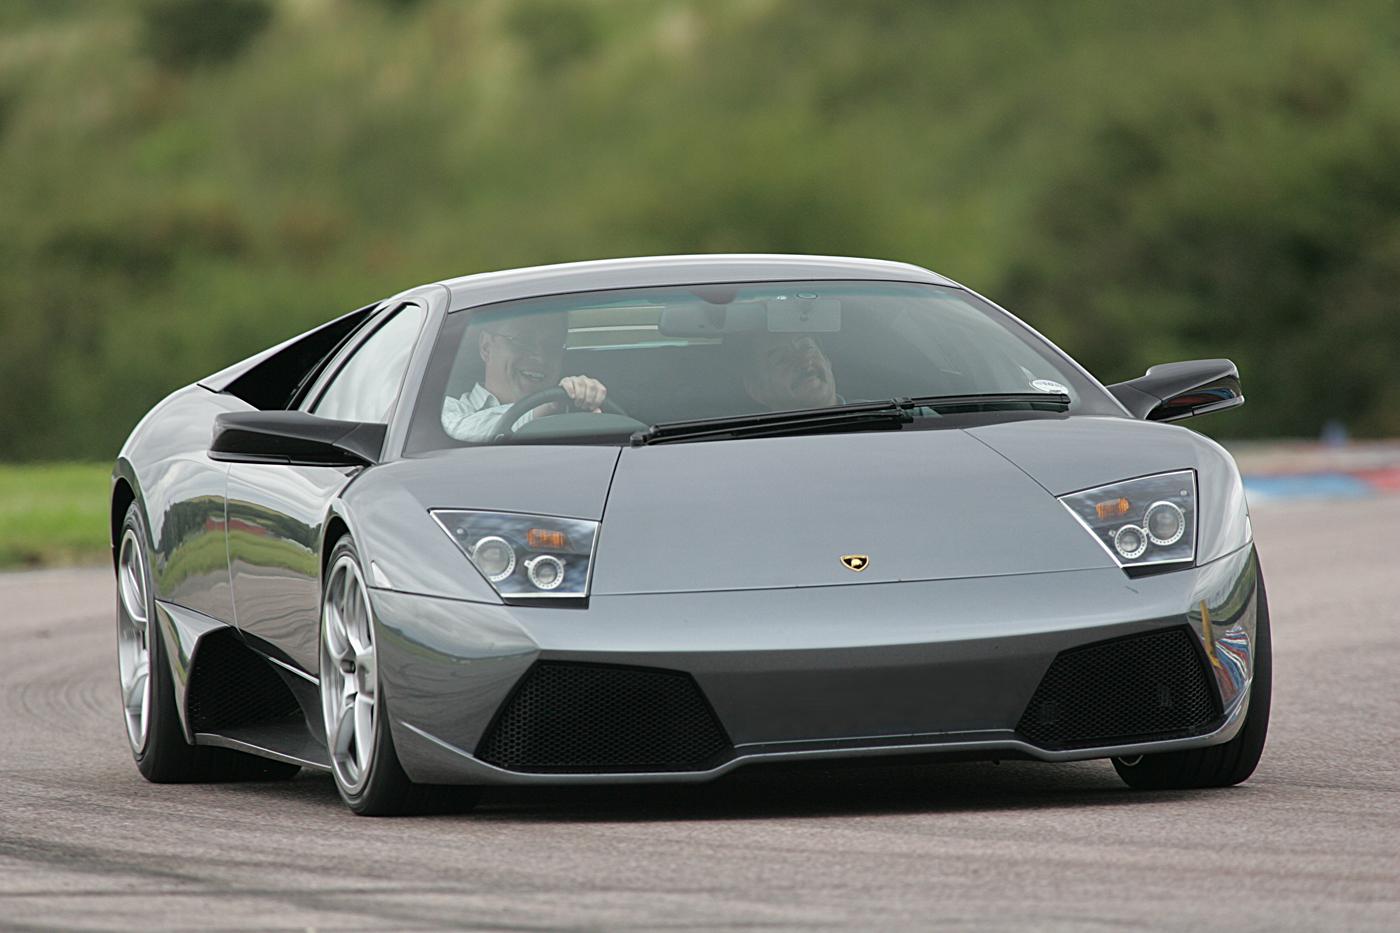 Lamborghini Murcielago Pics